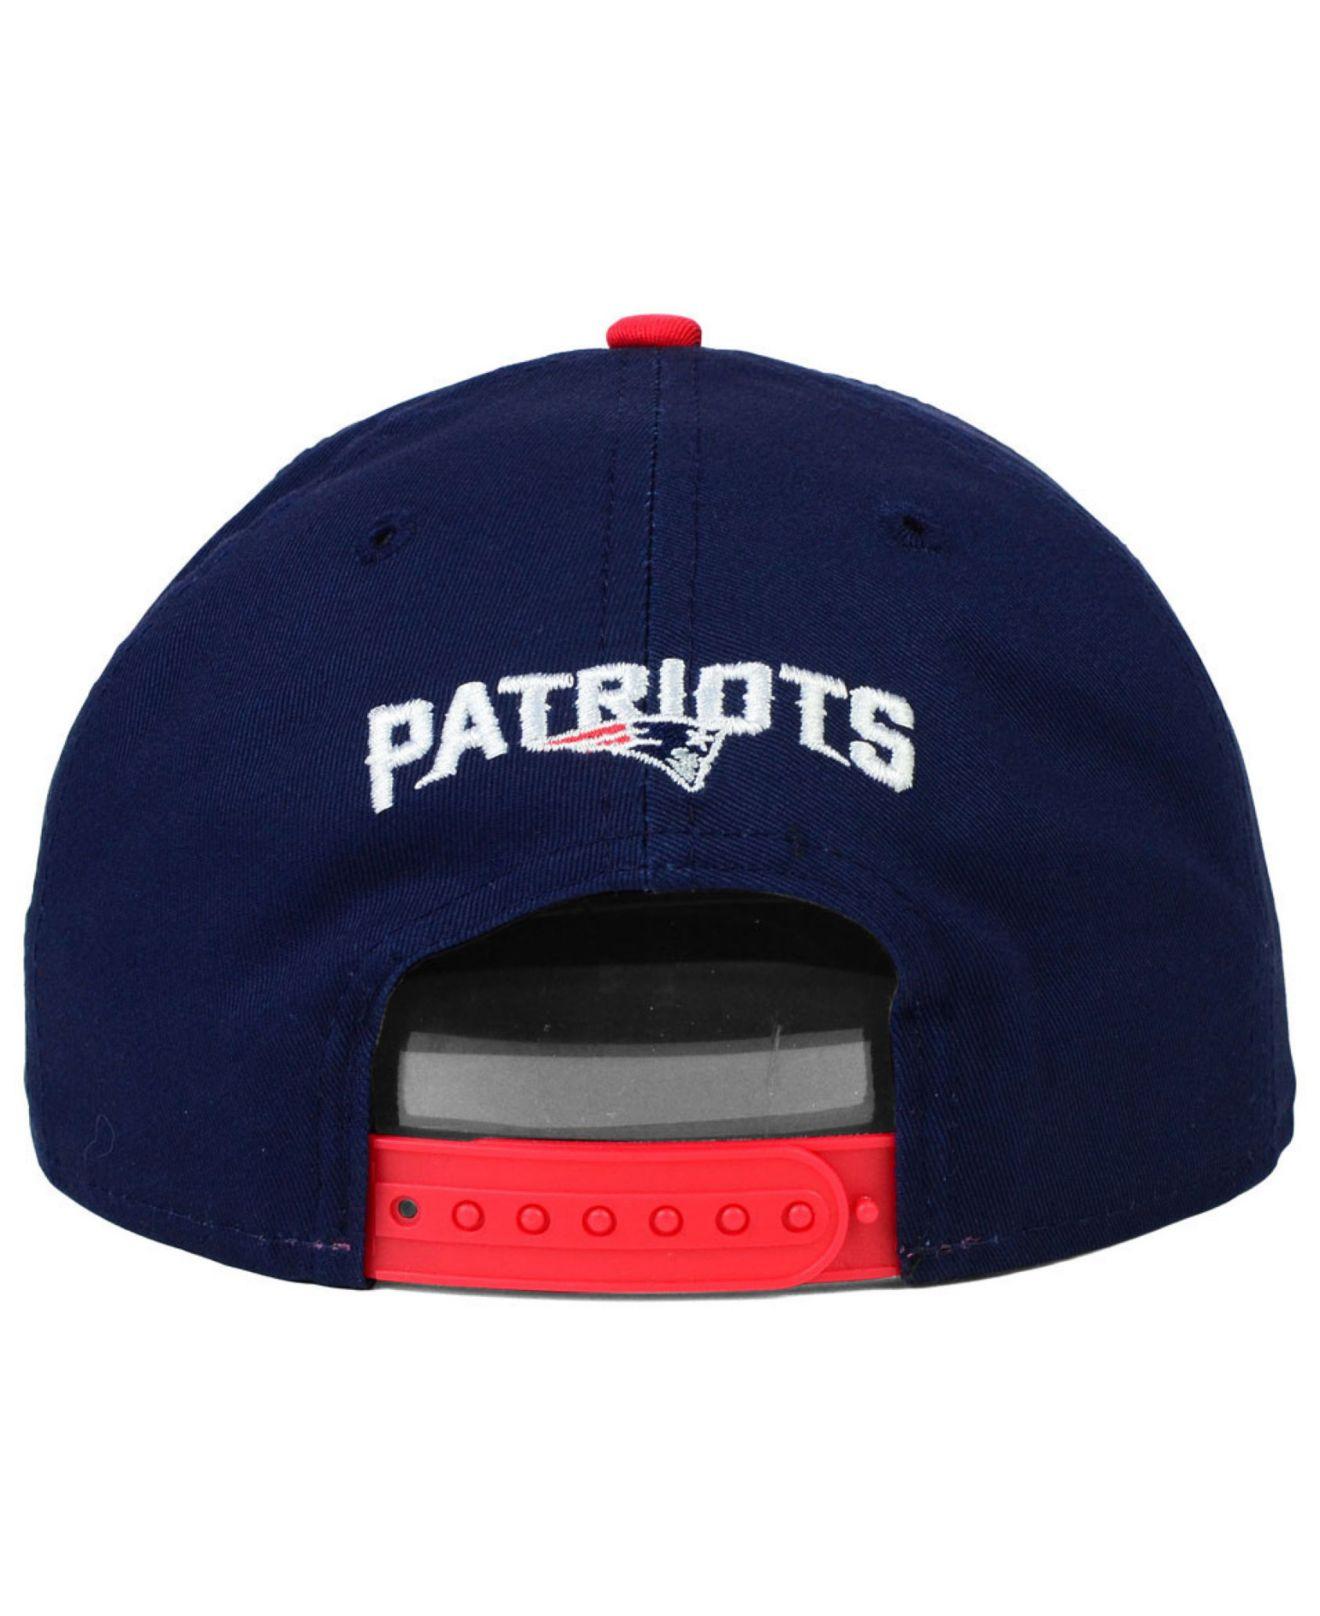 72cc87df9 Lyst - KTZ New England Patriots 2015 Nfl Draft 9Fifty Snapback Cap ...